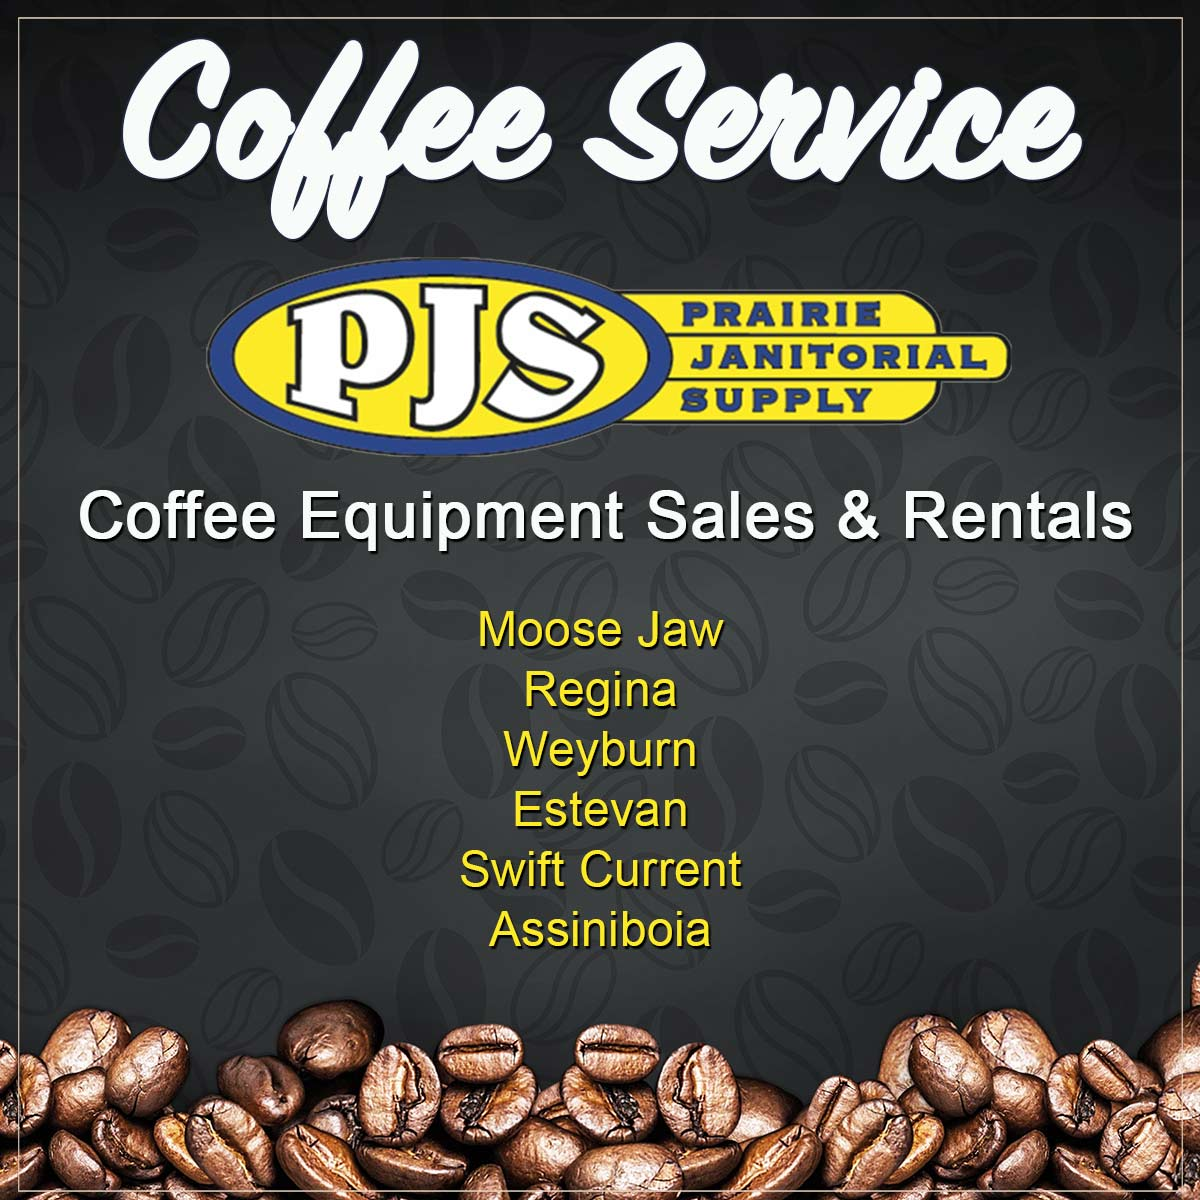 Prairie Janitorial Commercial Coffee Service Moose Jaw Regina Weyburn Estevan Swift Current Assiniboia